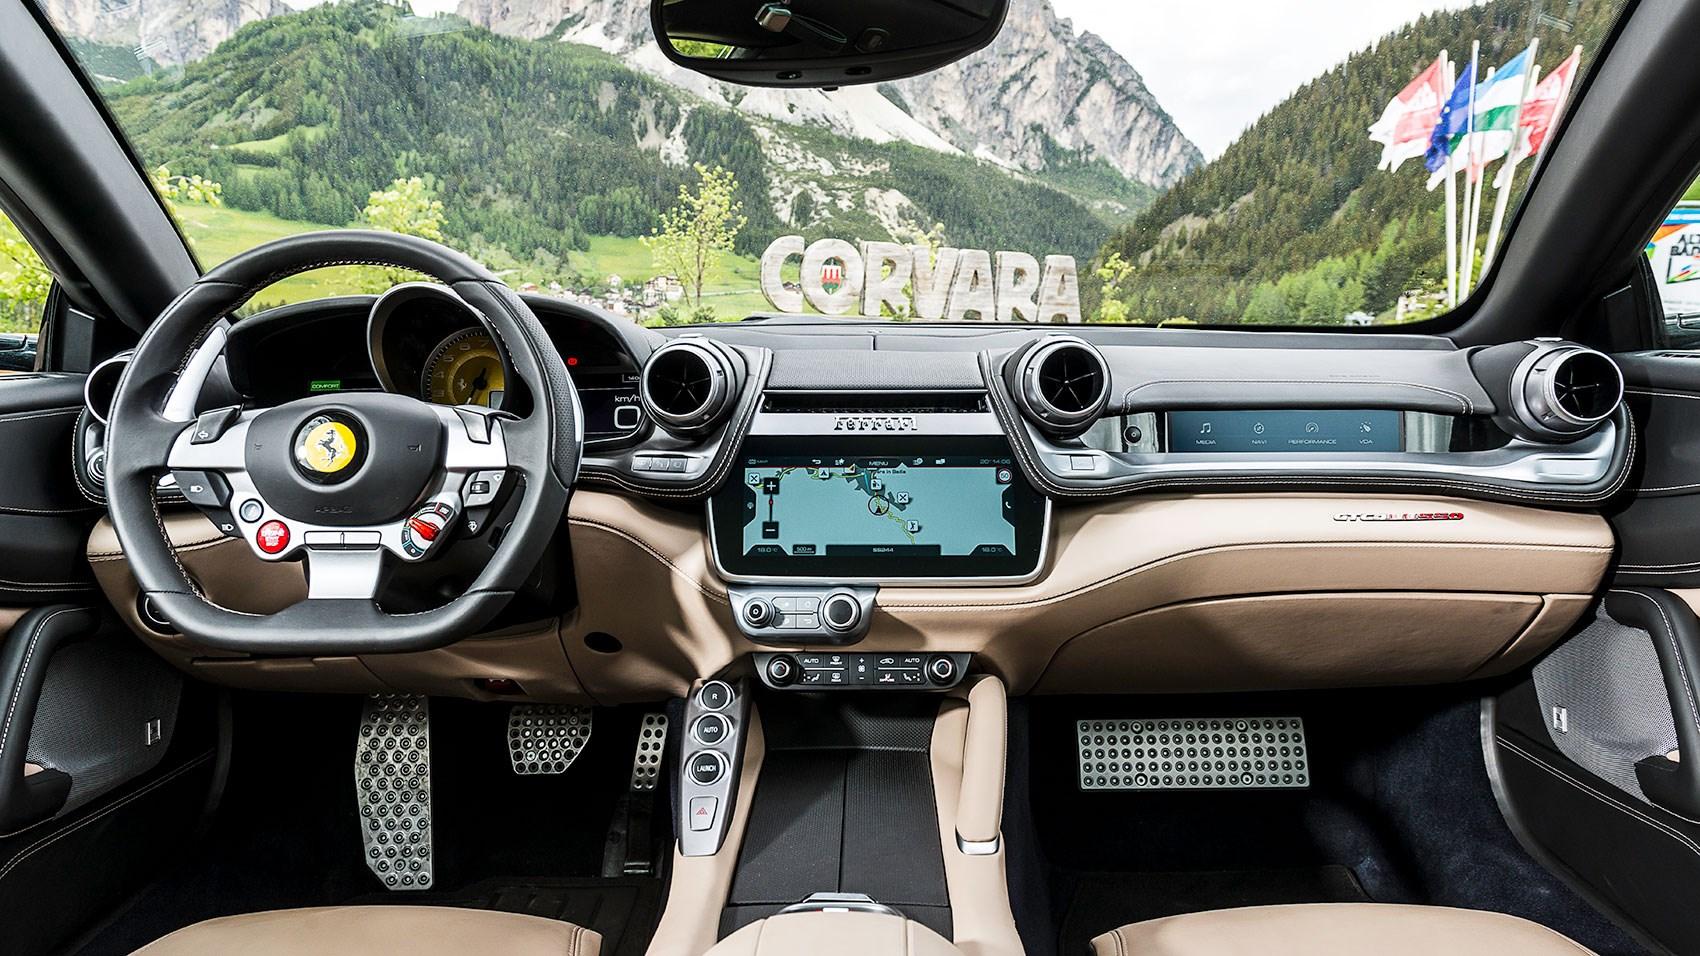 Ferrari Gtc4lusso 2016 Review By Car Magazine